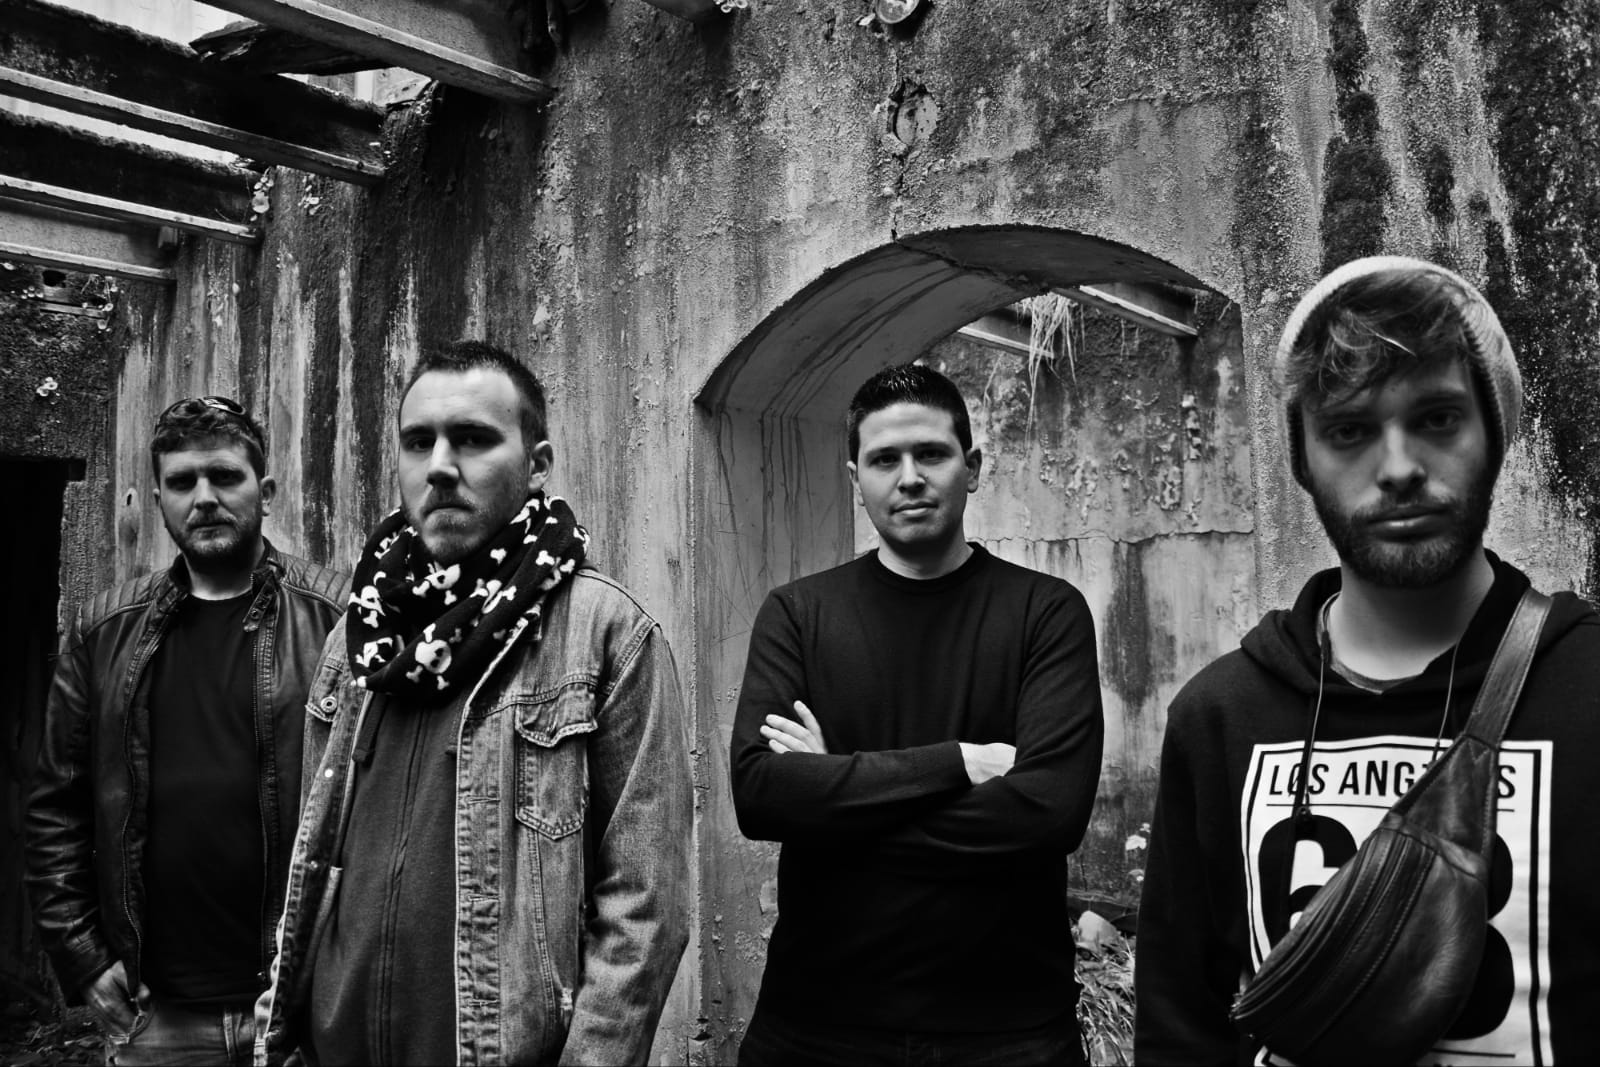 Calenton banda de rock de Plasencia